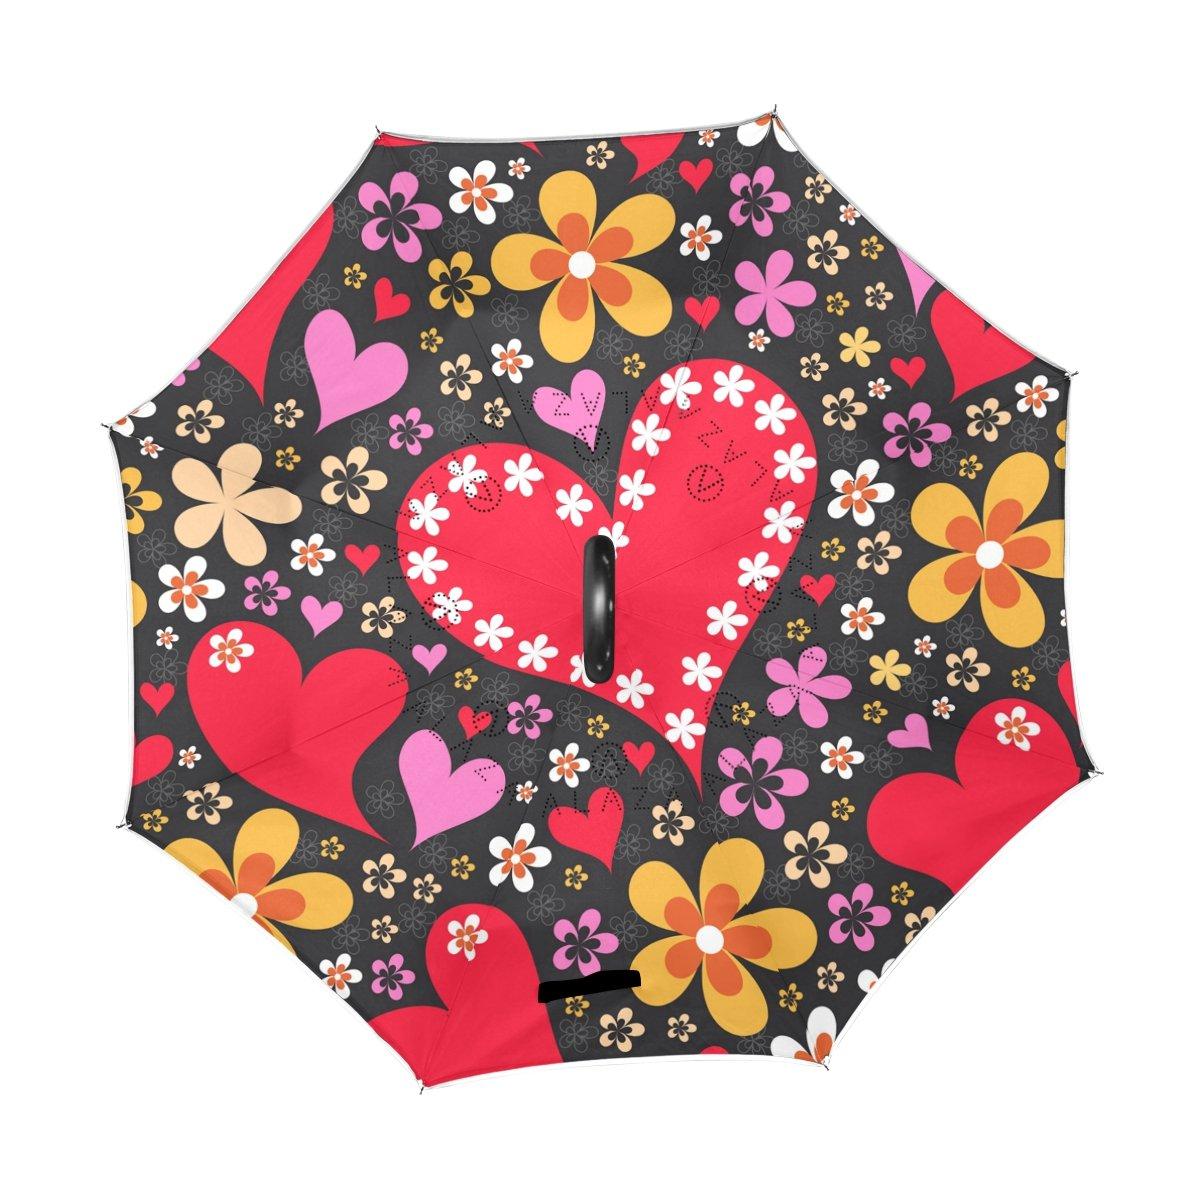 Alaza U Life Hippie Love誕生日バレンタインハートフローラル花逆Inverted Umbrellasリバーシブル太陽雨傘車屋外の使用C型のハンドル B07DFX487B